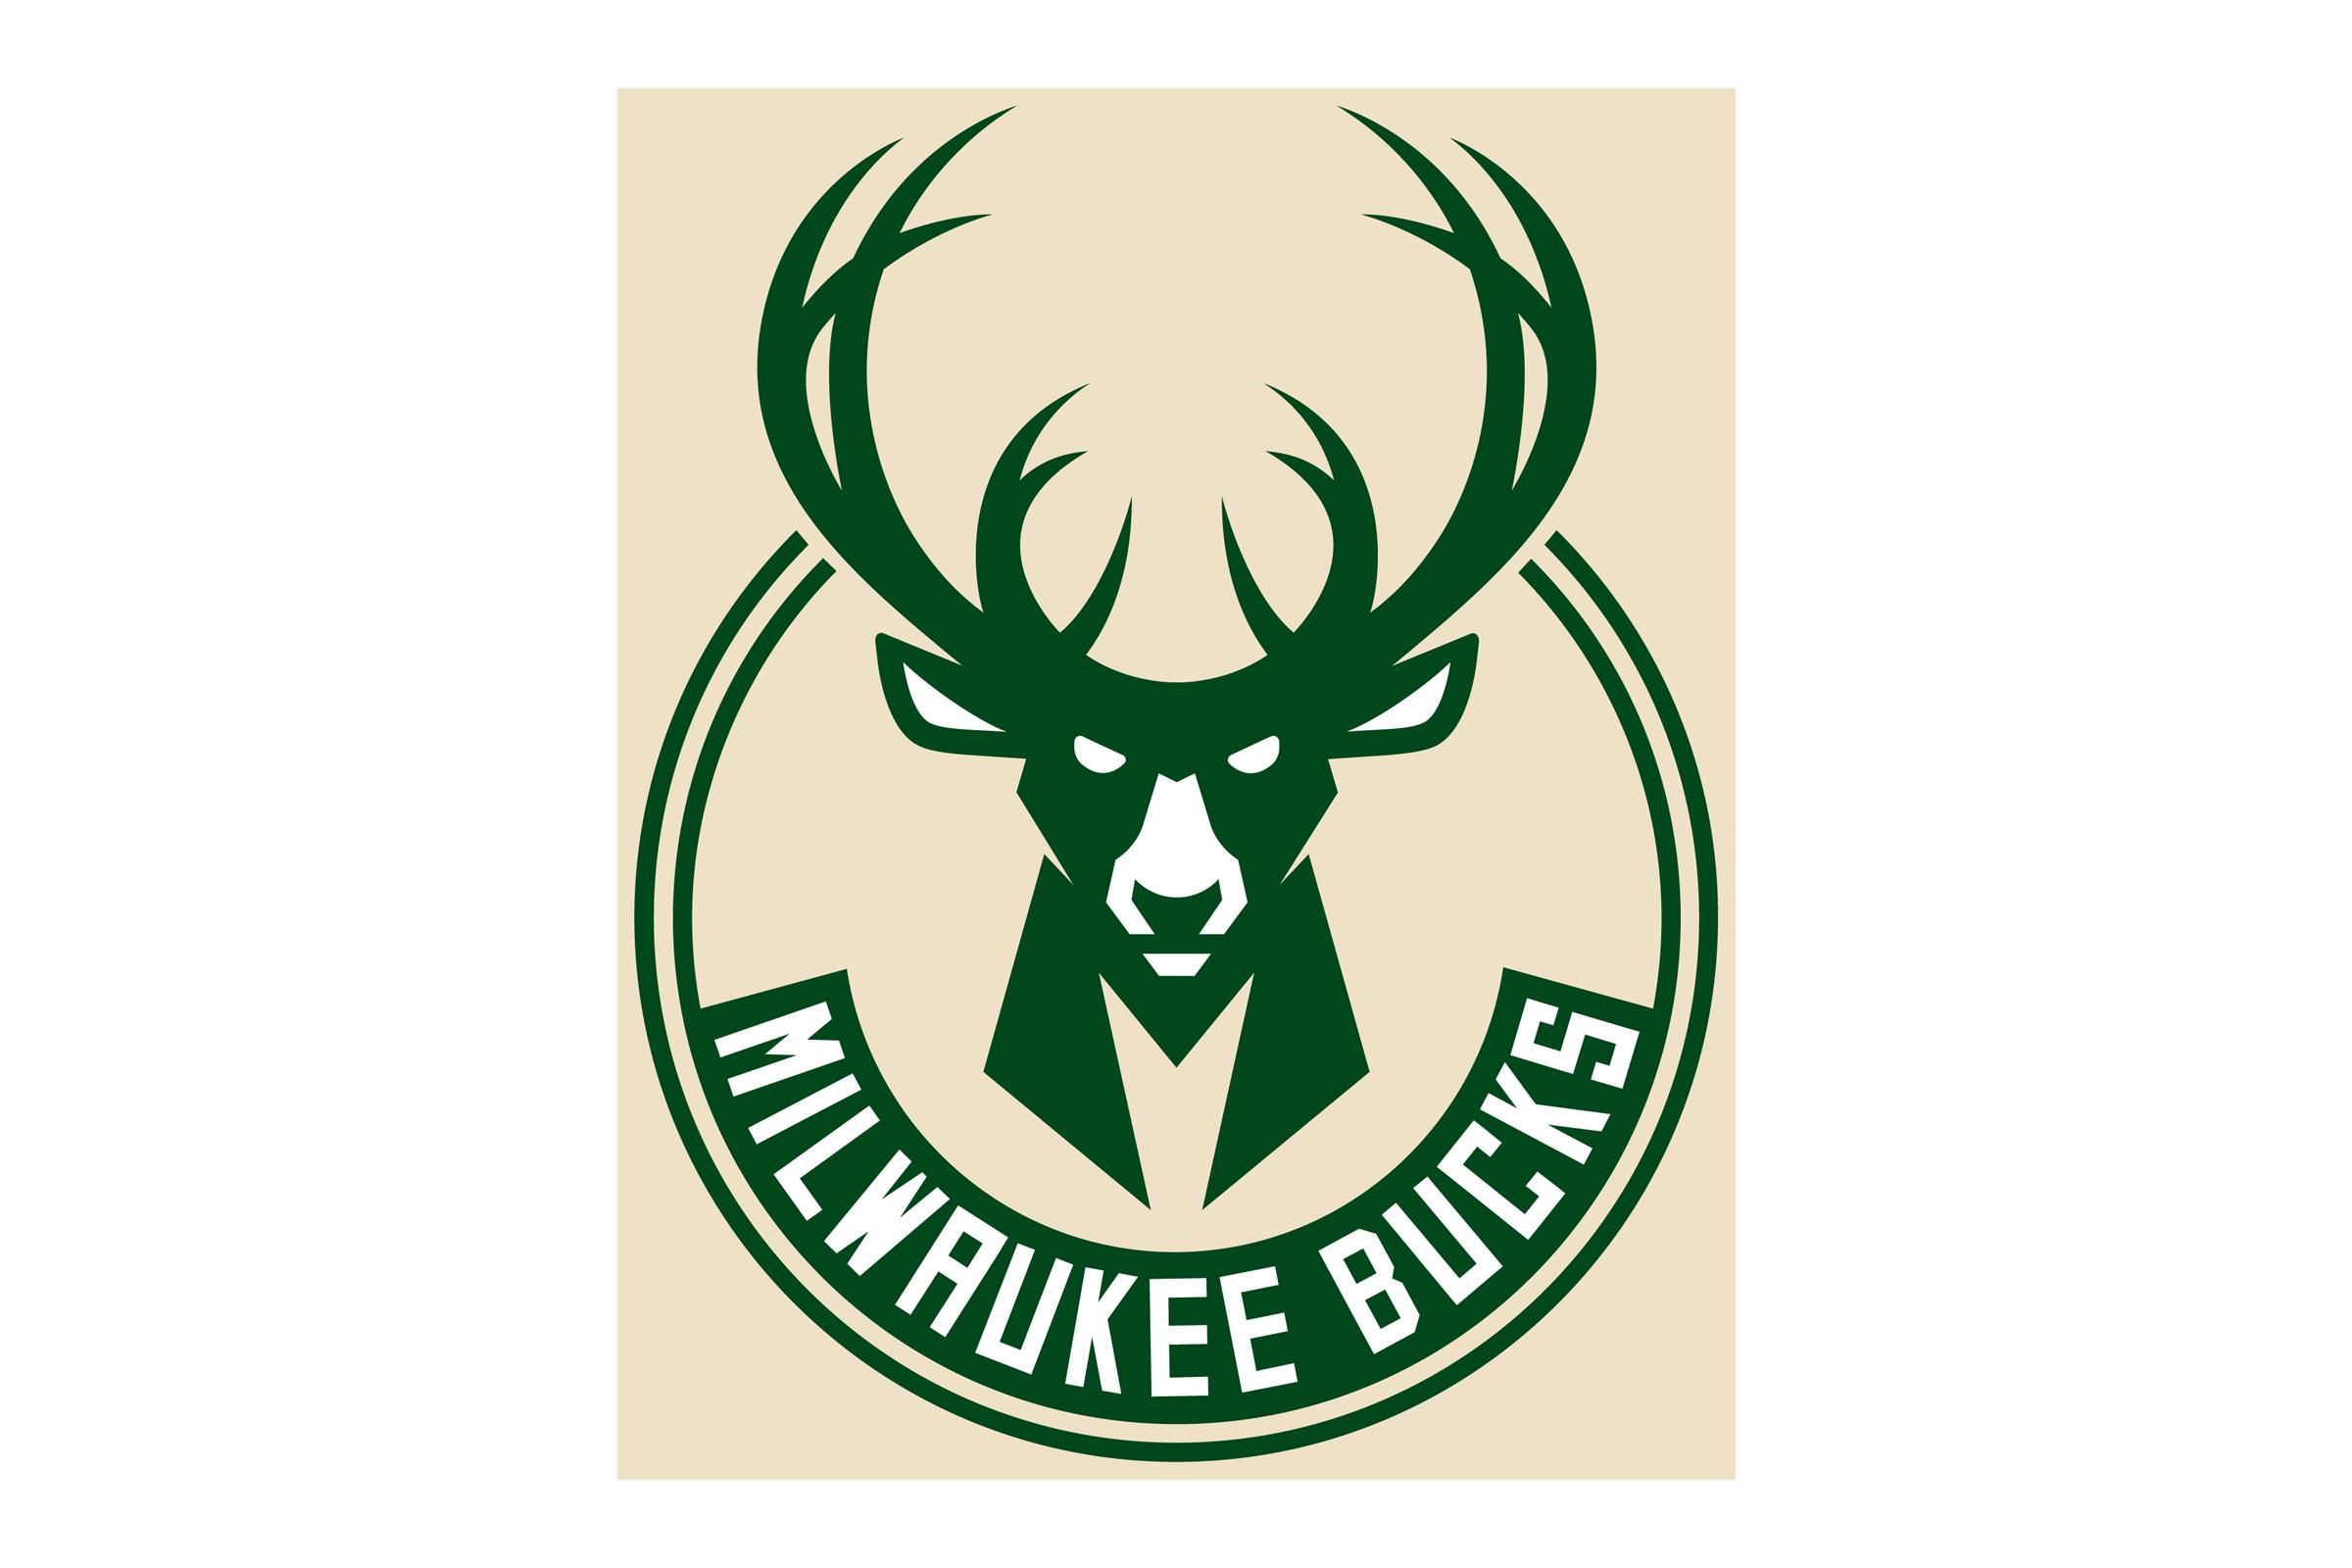 Milwaukee Bucks - 28.60% growth rate - fACEBOOK(vs. -2.67% via league average)